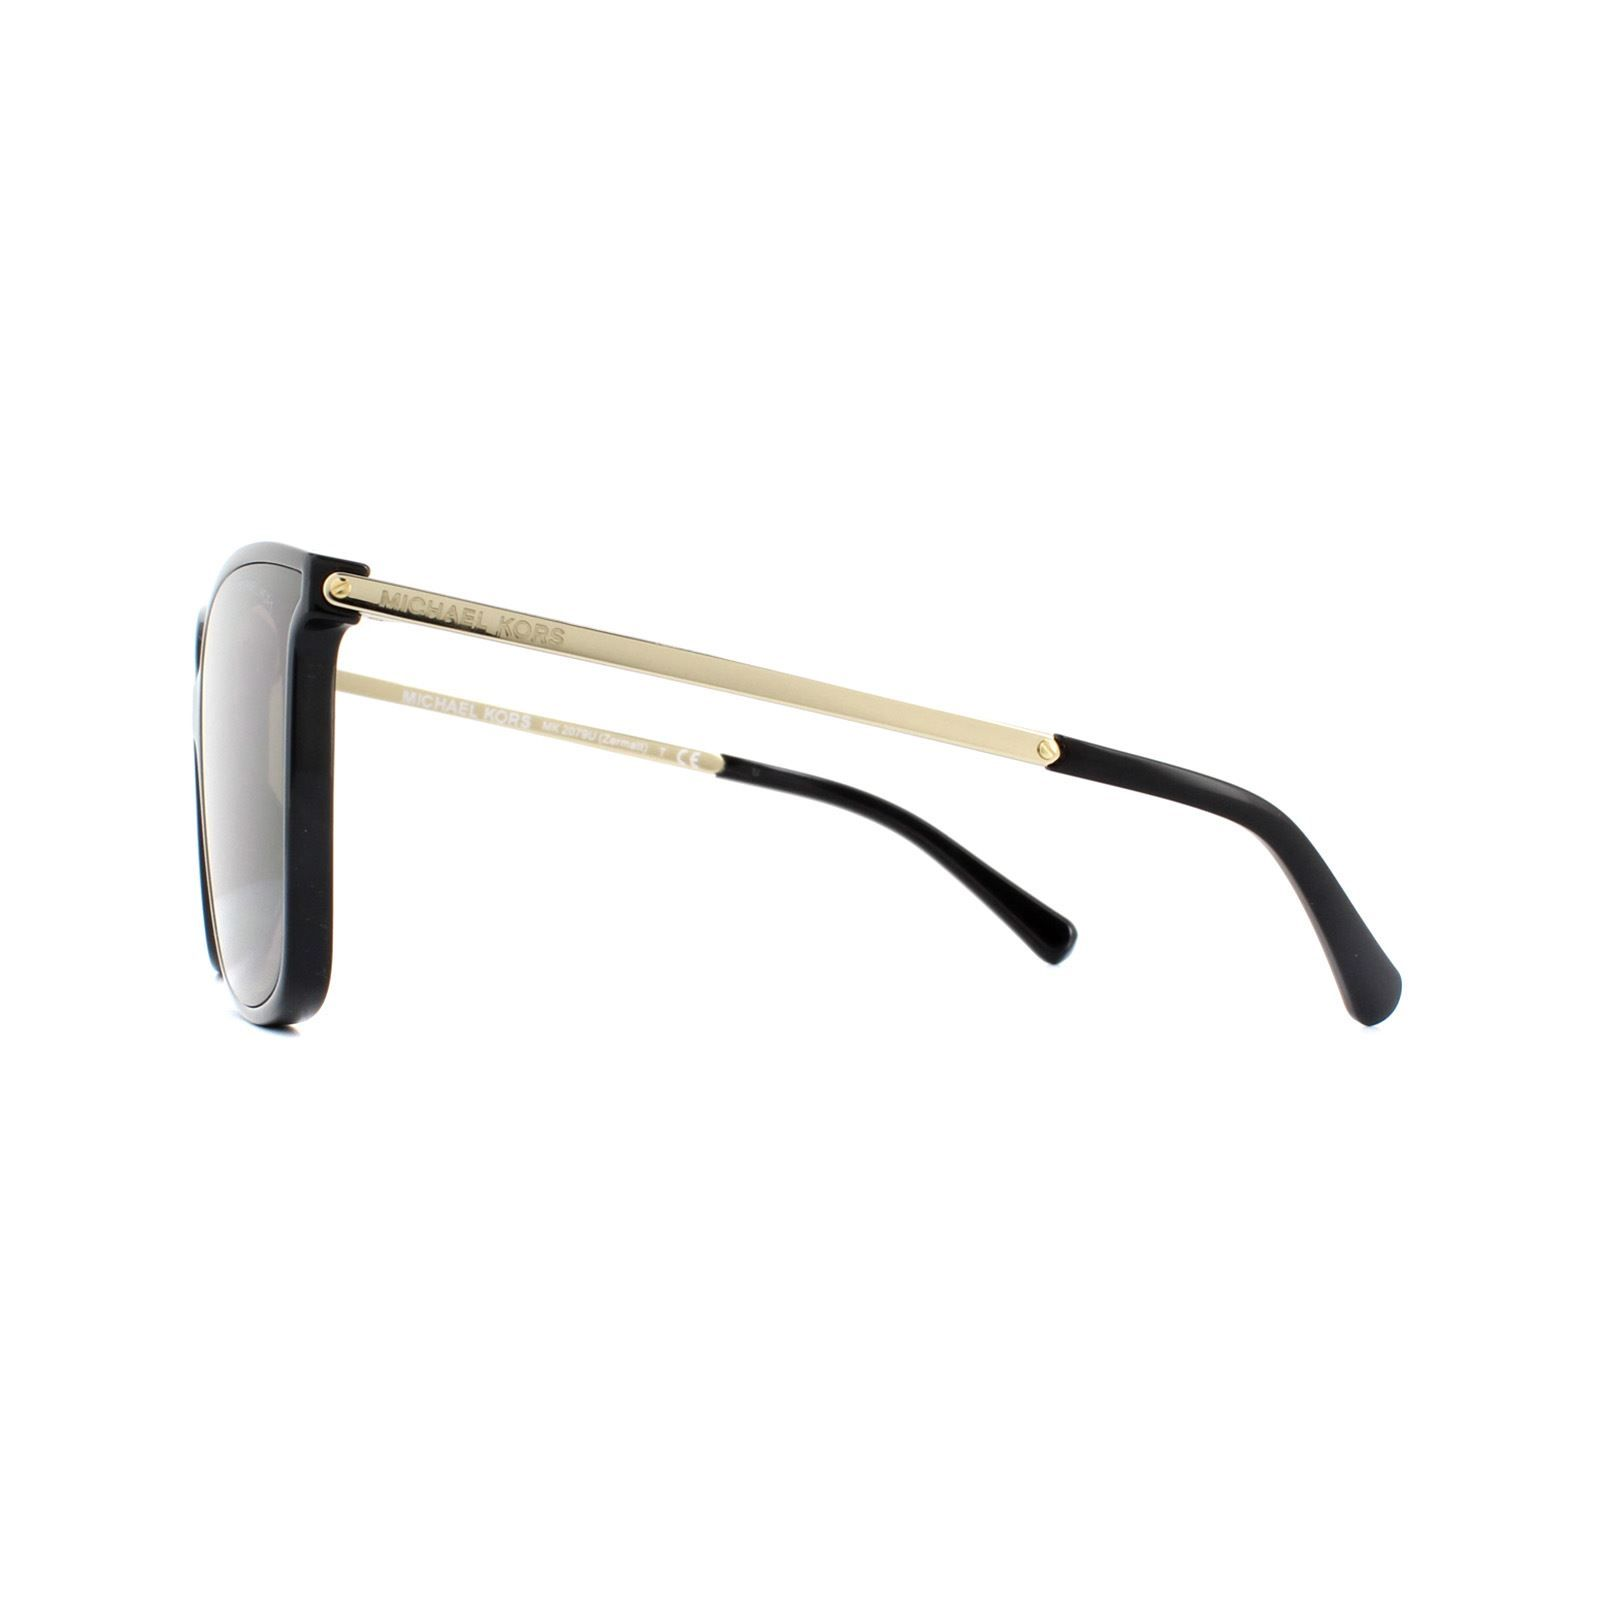 Michael Kors Sunglasses Zermatt 2079U 333273 Shiny Black & Metallic Gold Brown